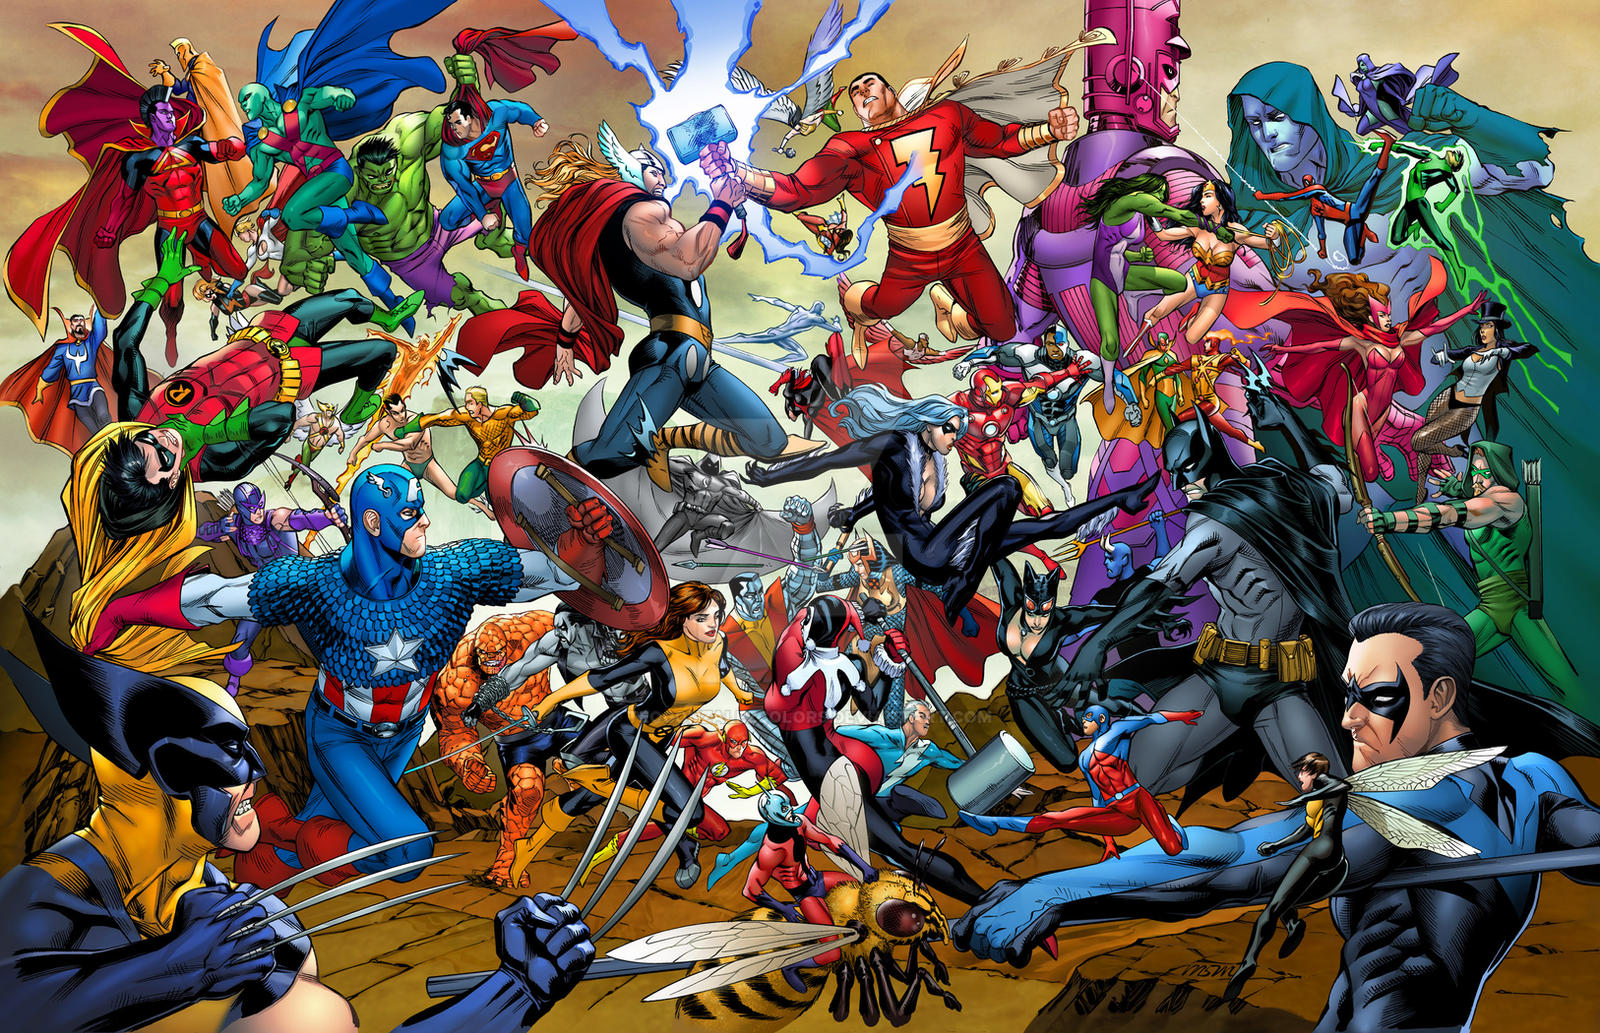 Marvel Vs DC Poster By TeoGonzalezColors On DeviantArt